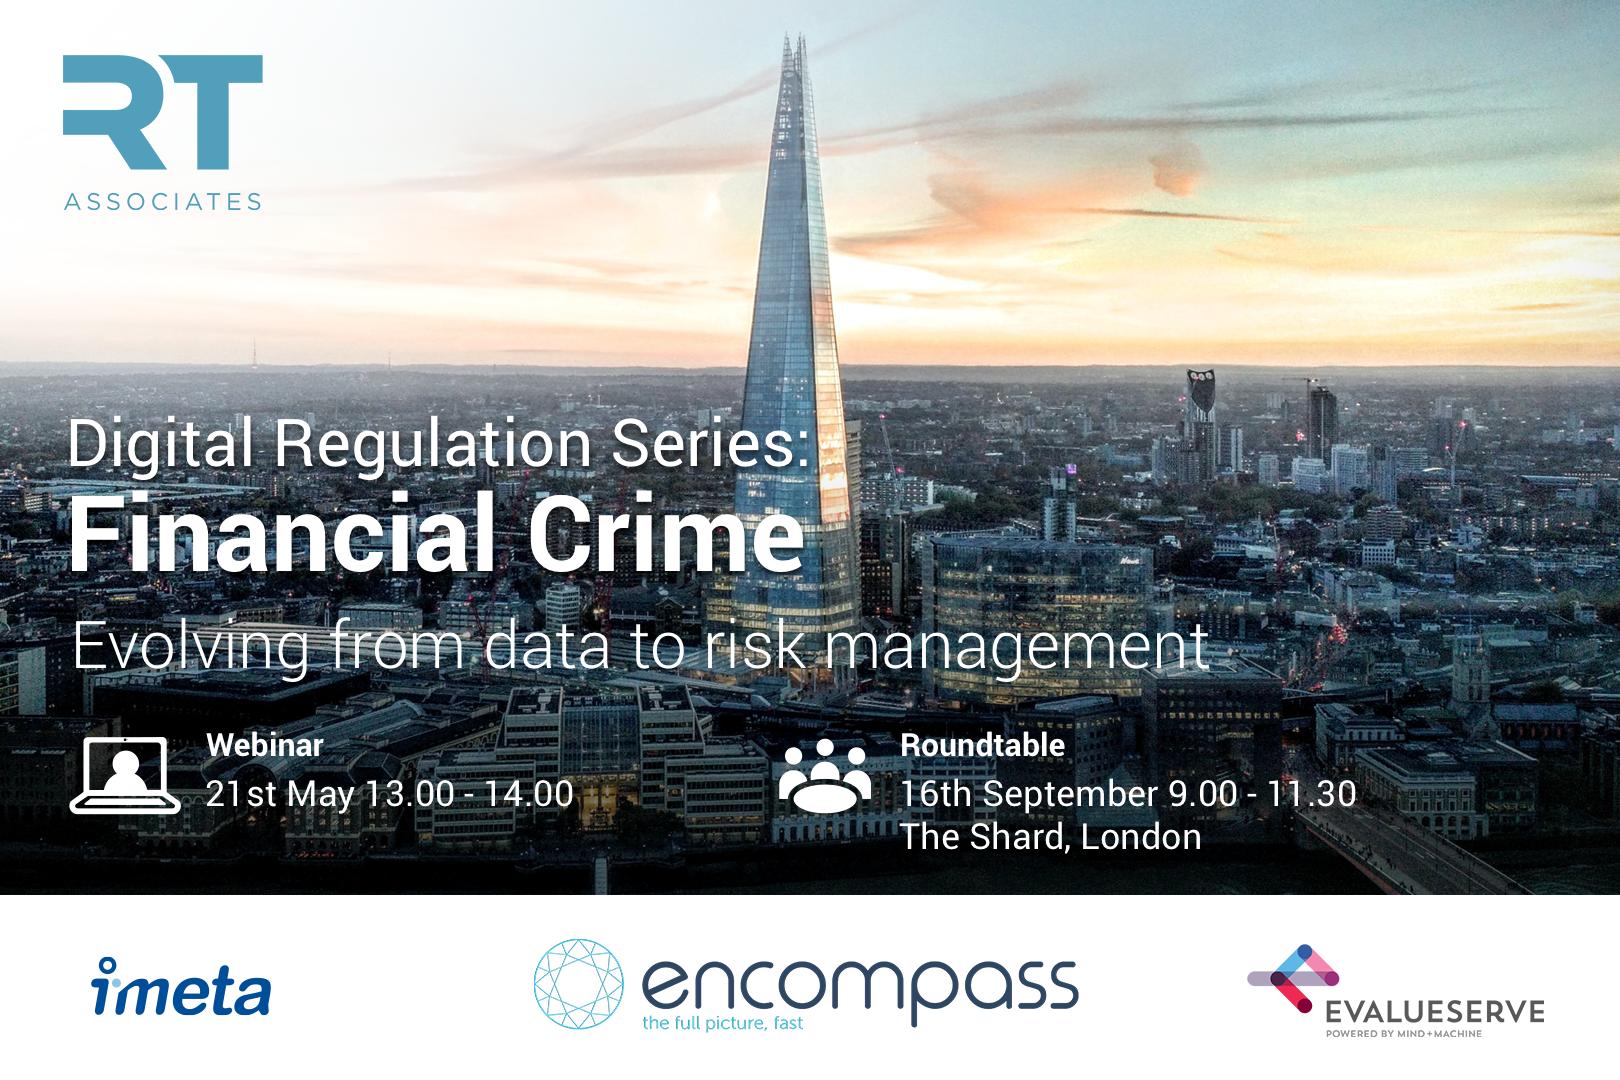 Digital Regulation Series KYC - Evolving from data to risk management